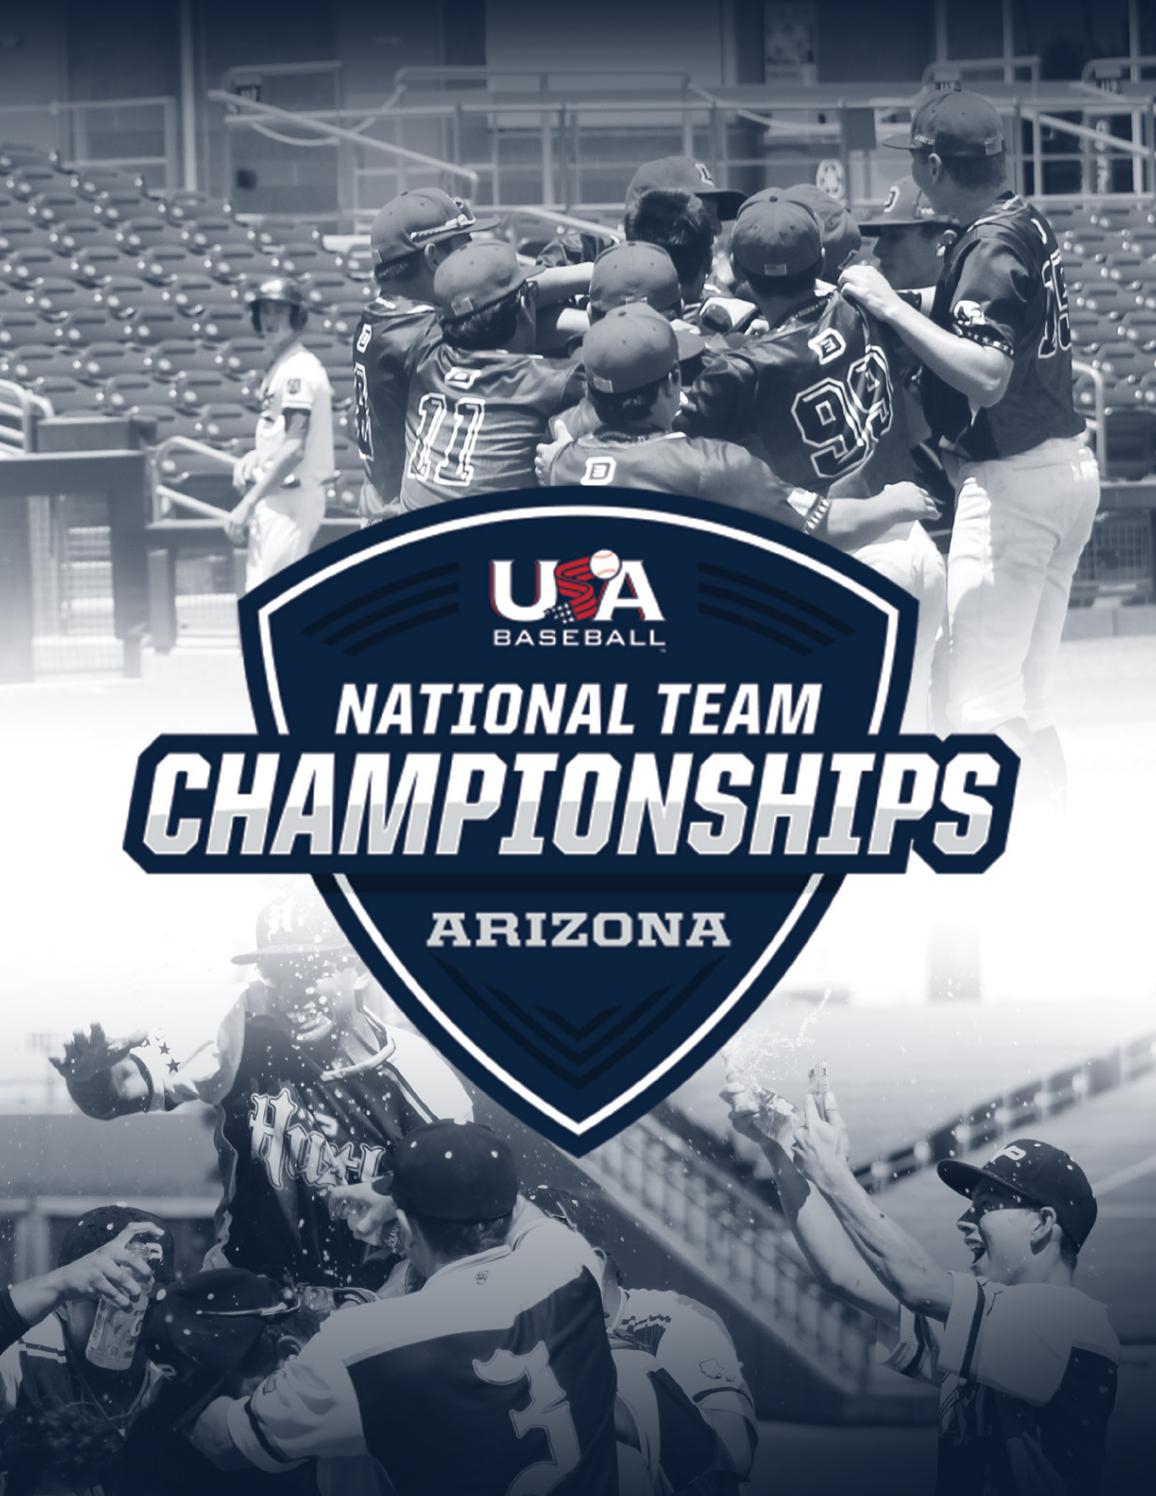 2019 Usa Baseball National Team Championships (Arizona Pertaining To Billings School District 2 2021 20 Calendar